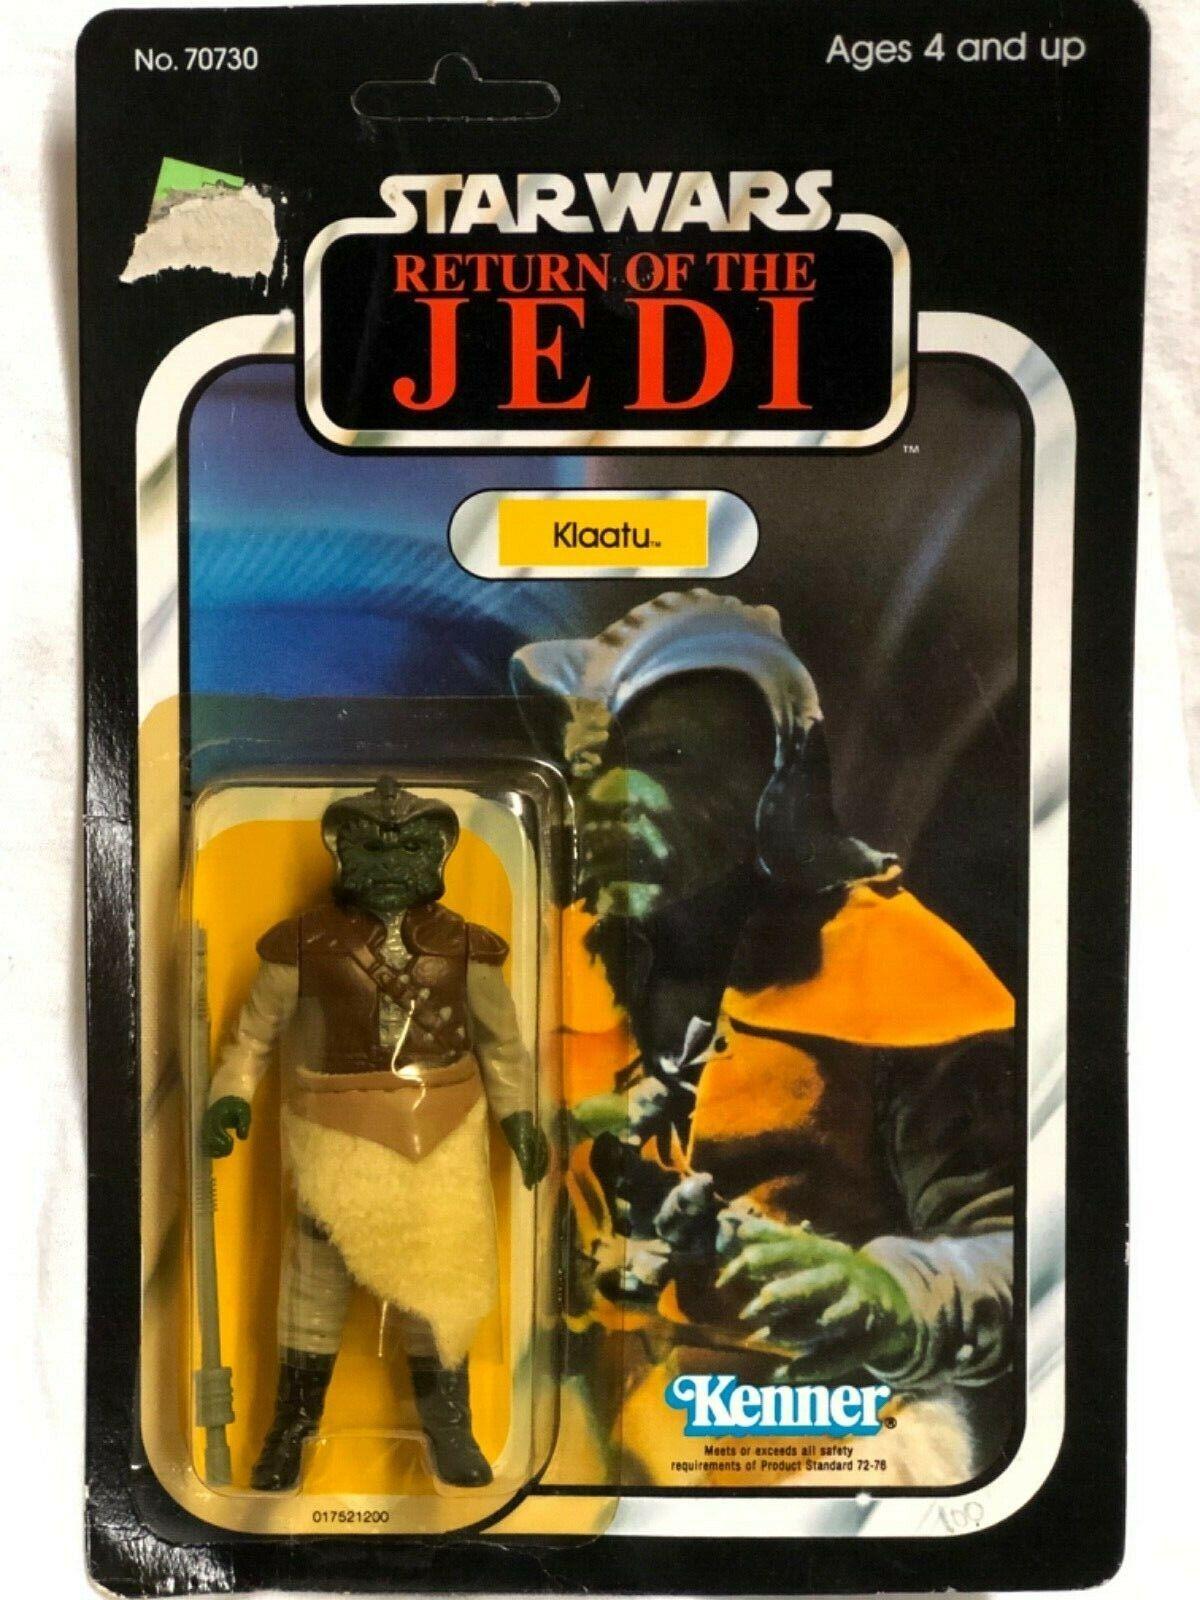 Menta en tarjeta 1983 Klaatu retorno de las Jedi de Estrella wars regreso del Jedi U P